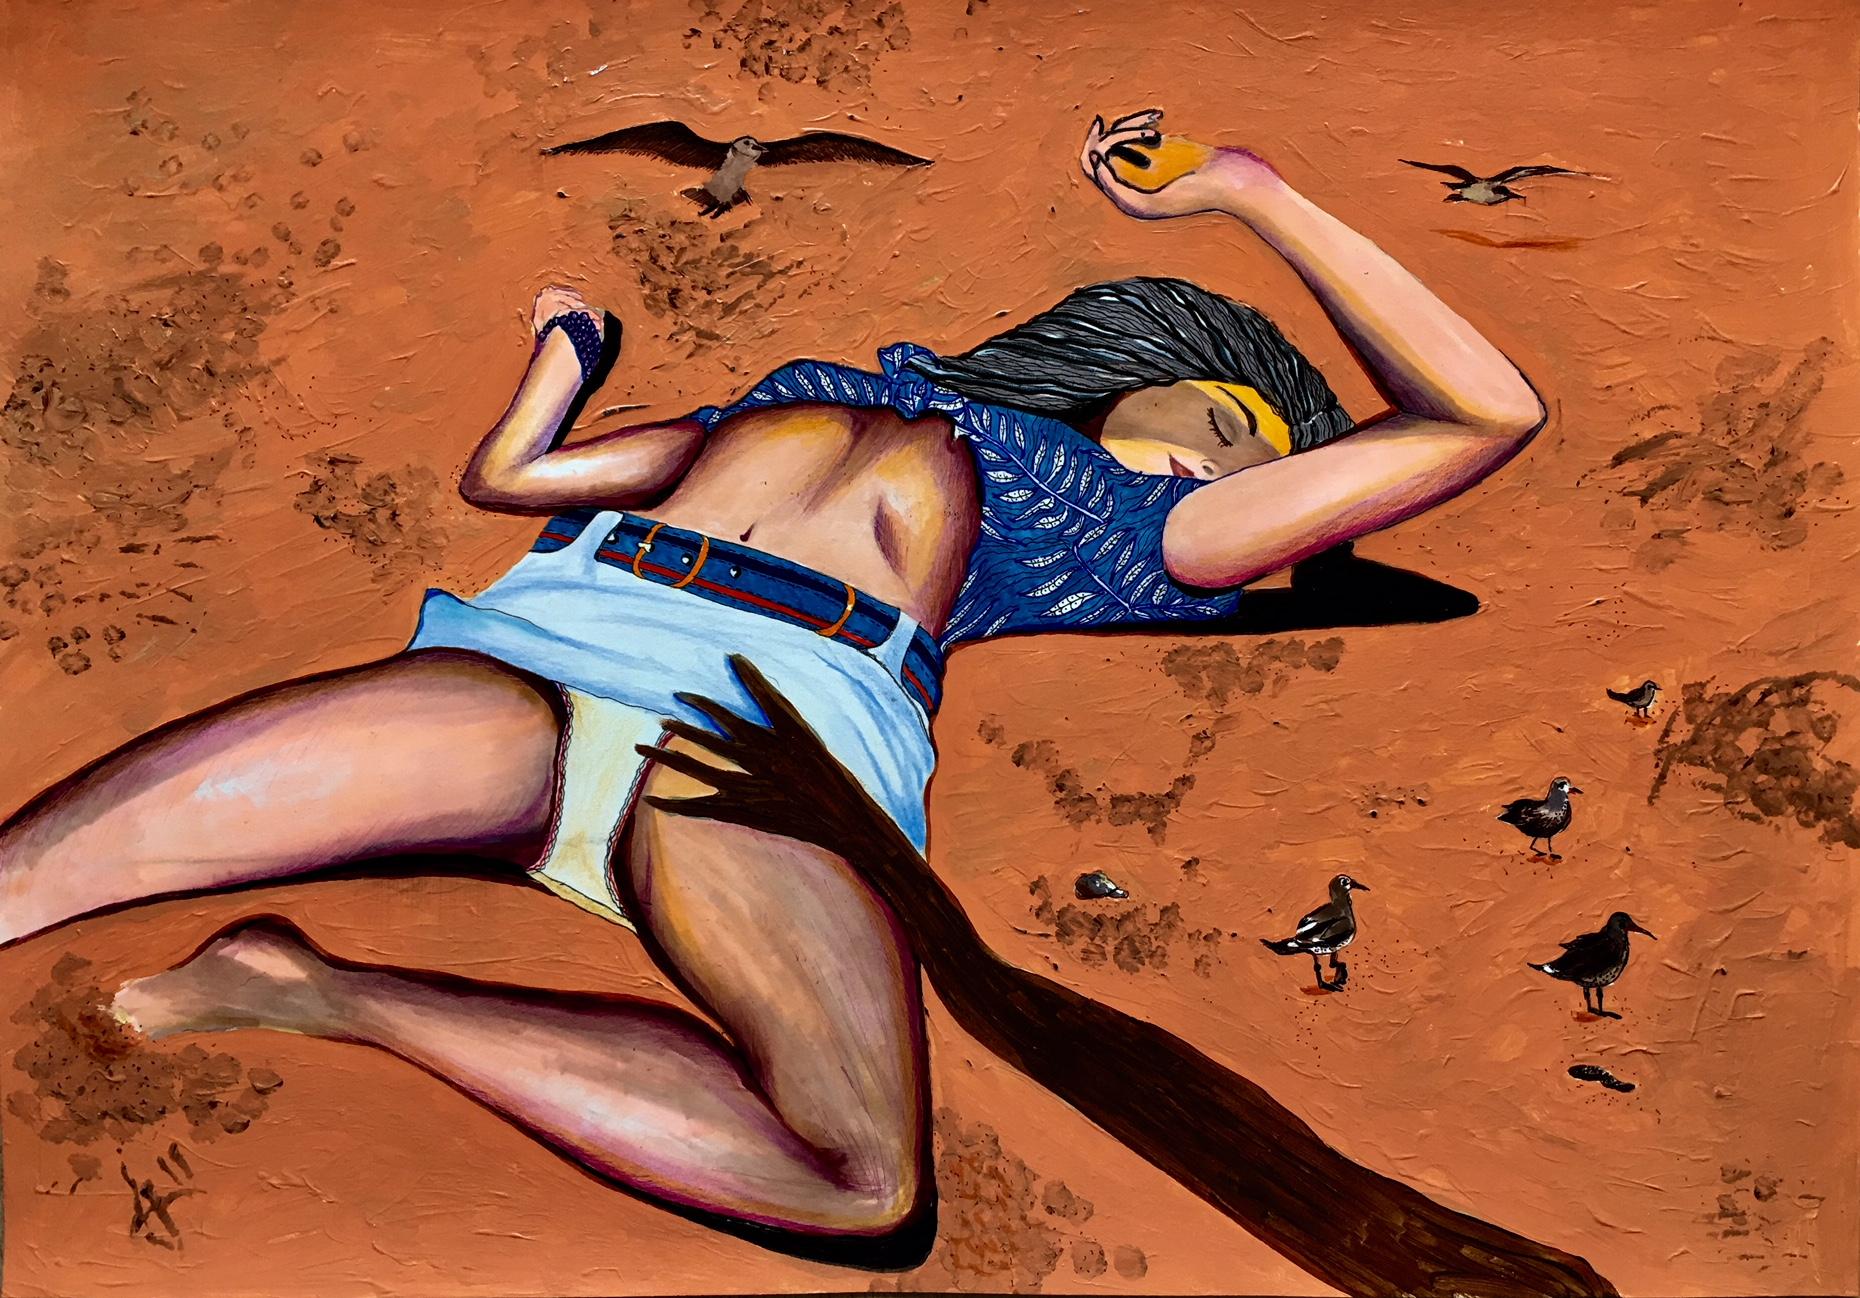 Lady on sand